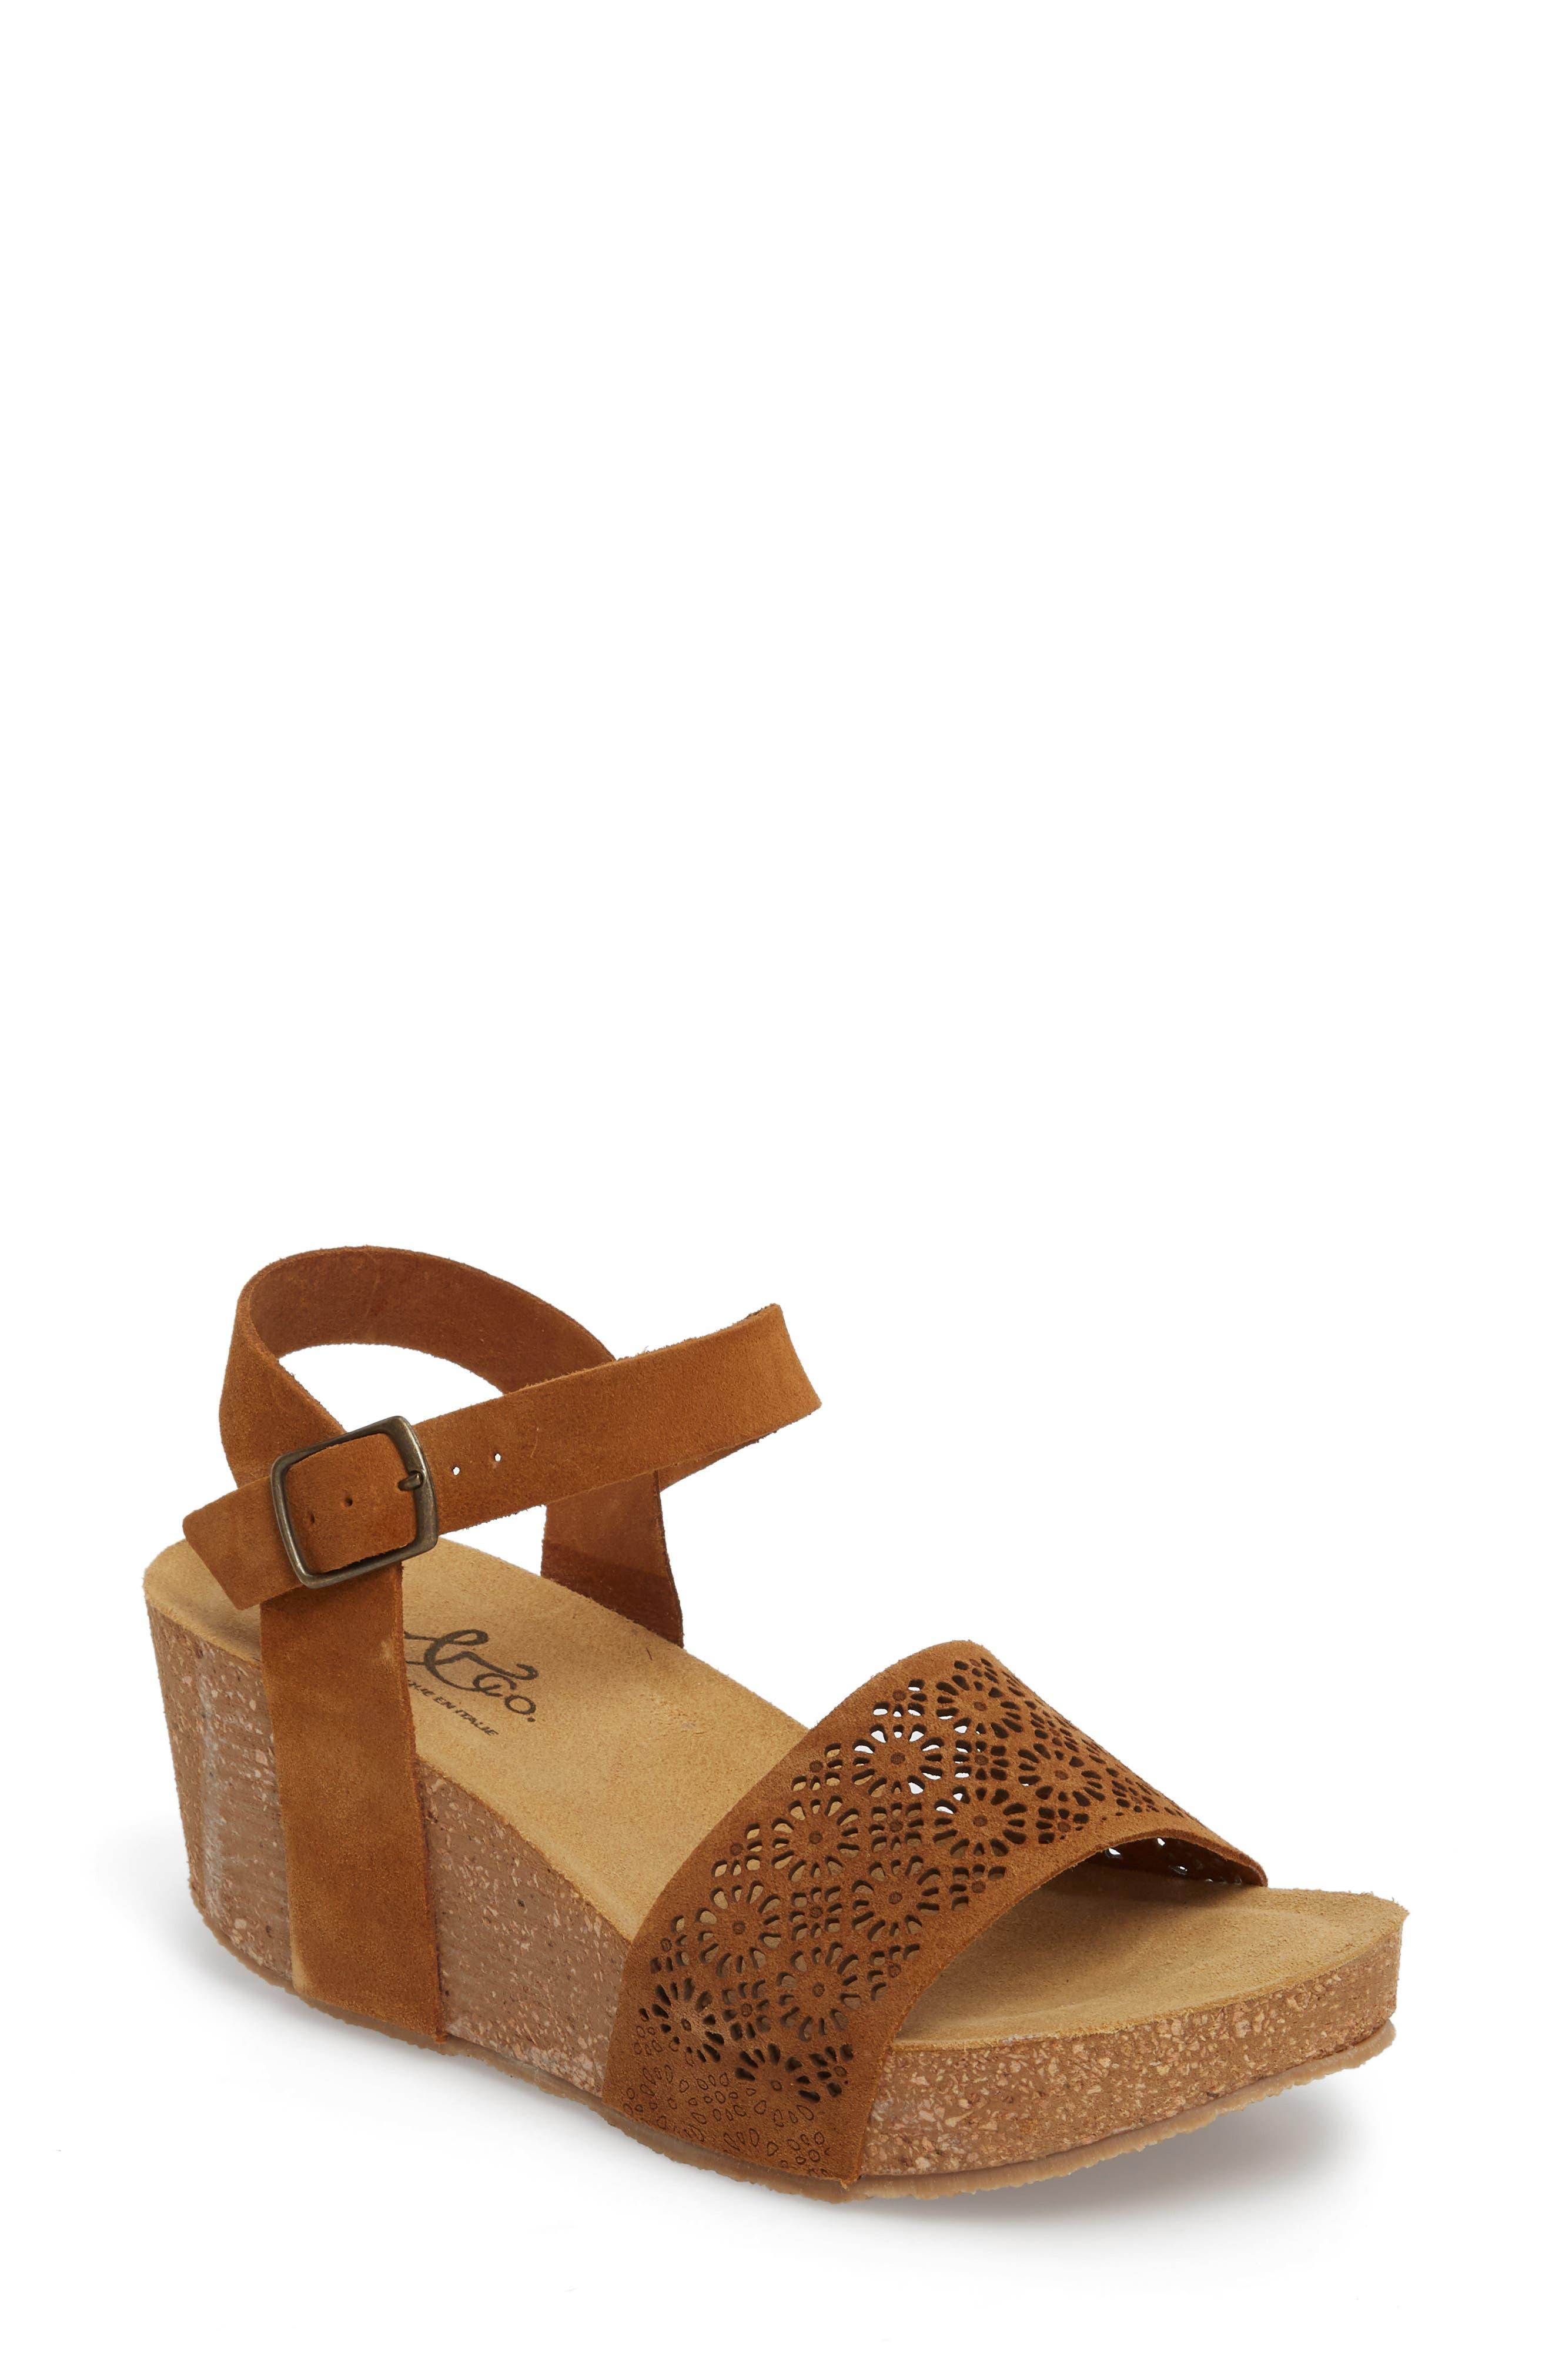 Bos. & Co. Lolo Platform Wedge Sandal, Brown